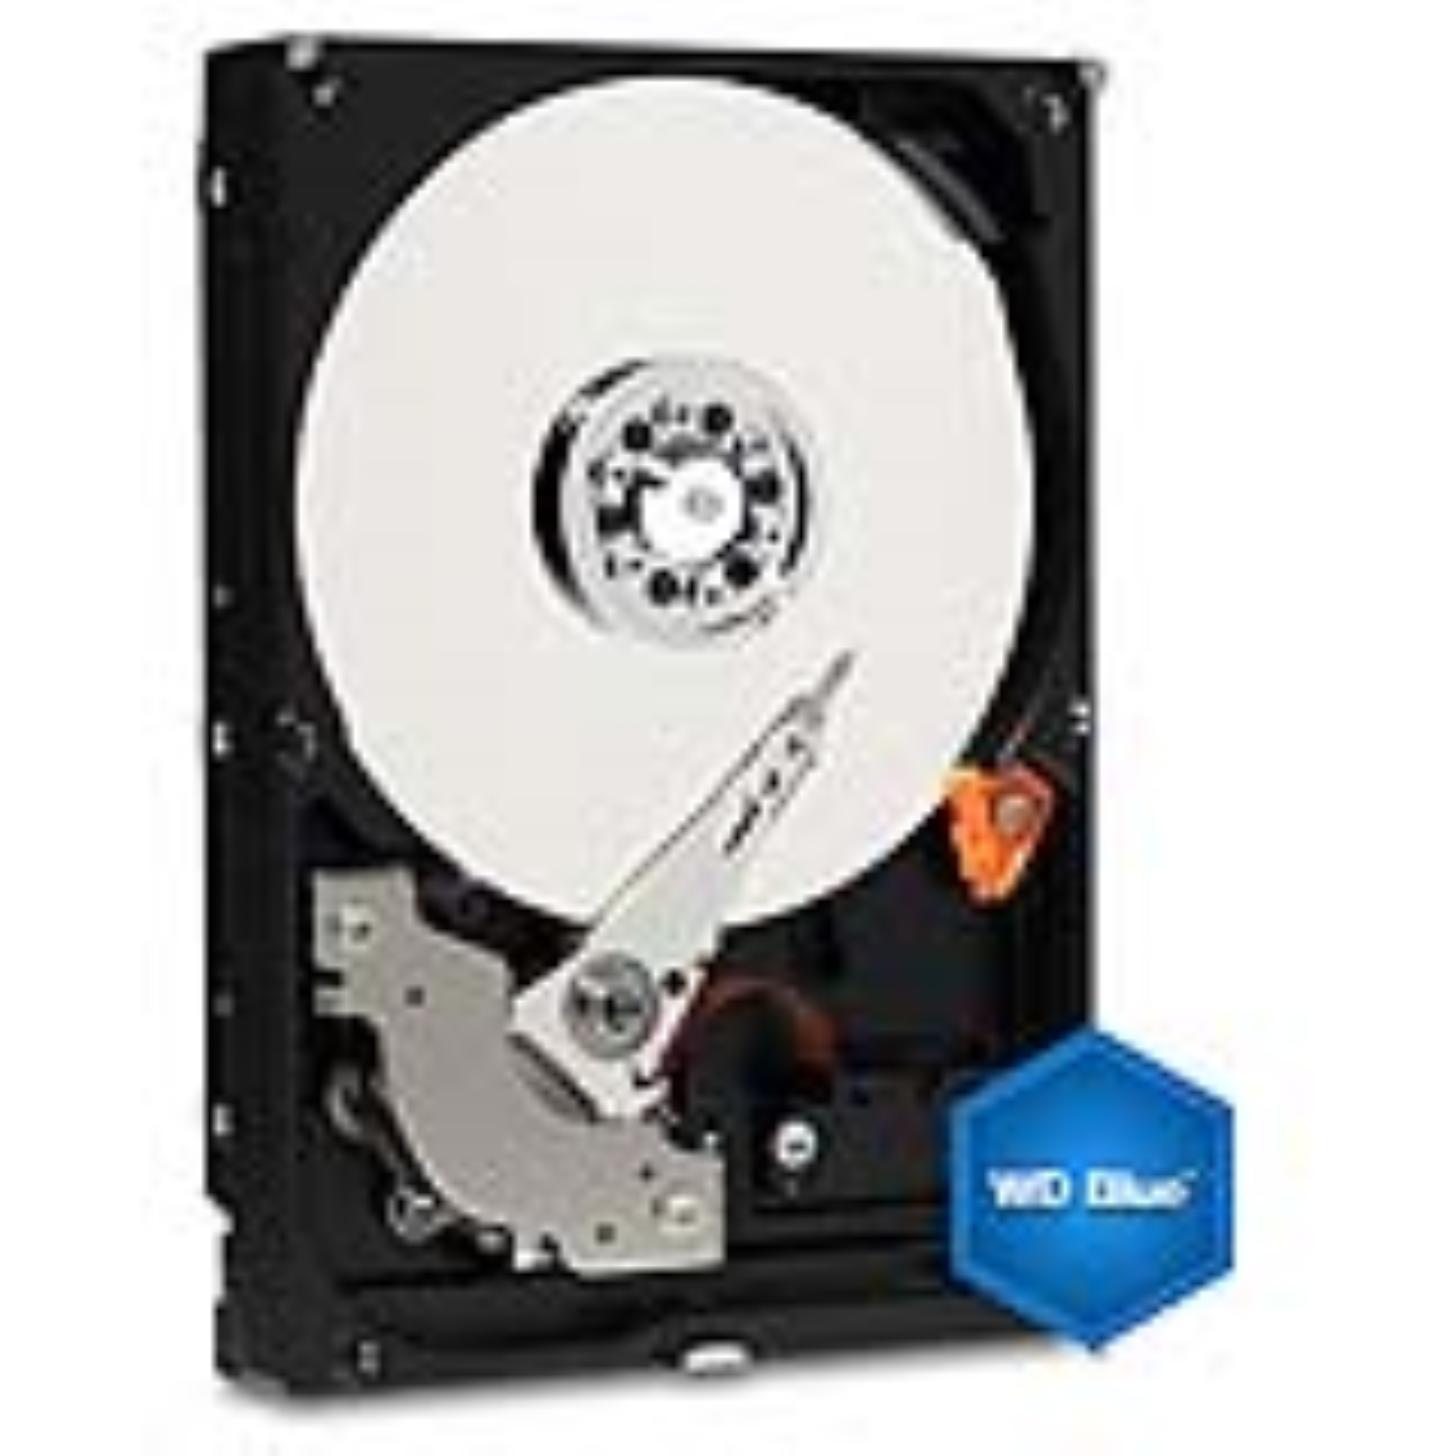 WD Blue WD60EZRZ 6TB HDD 3.5'', SATA/600, 64MB cache